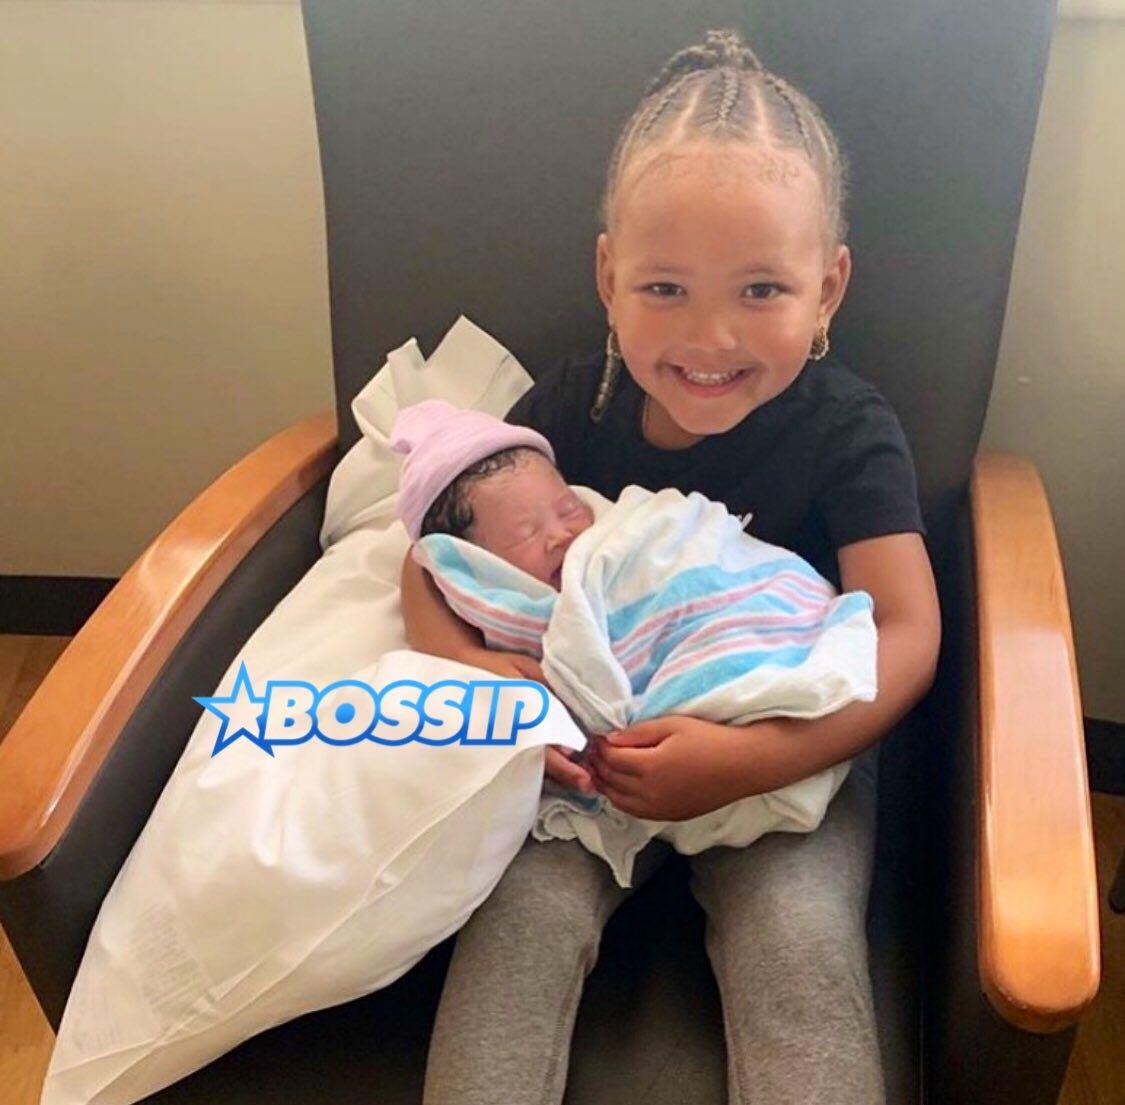 YG's daughter Harmony holds her little sister Vibe